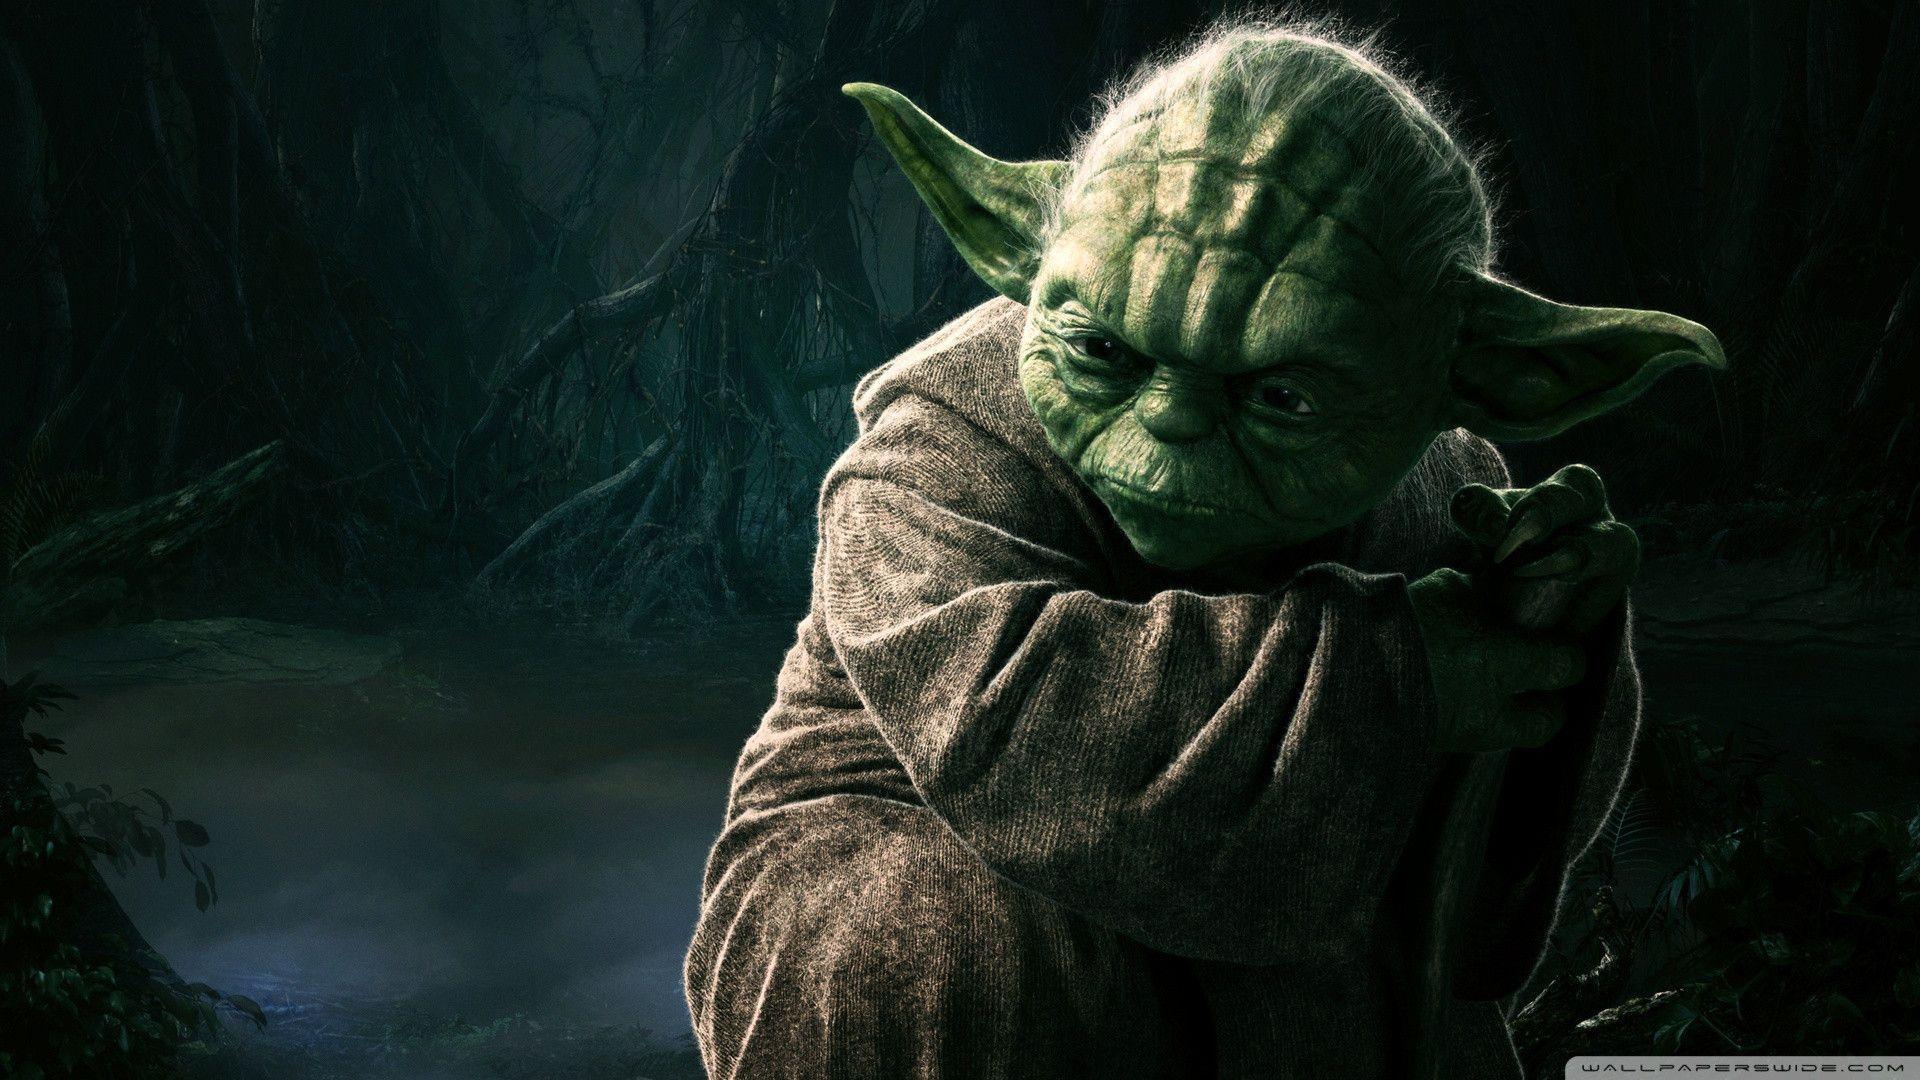 Star Wars Wallpapers 1080p